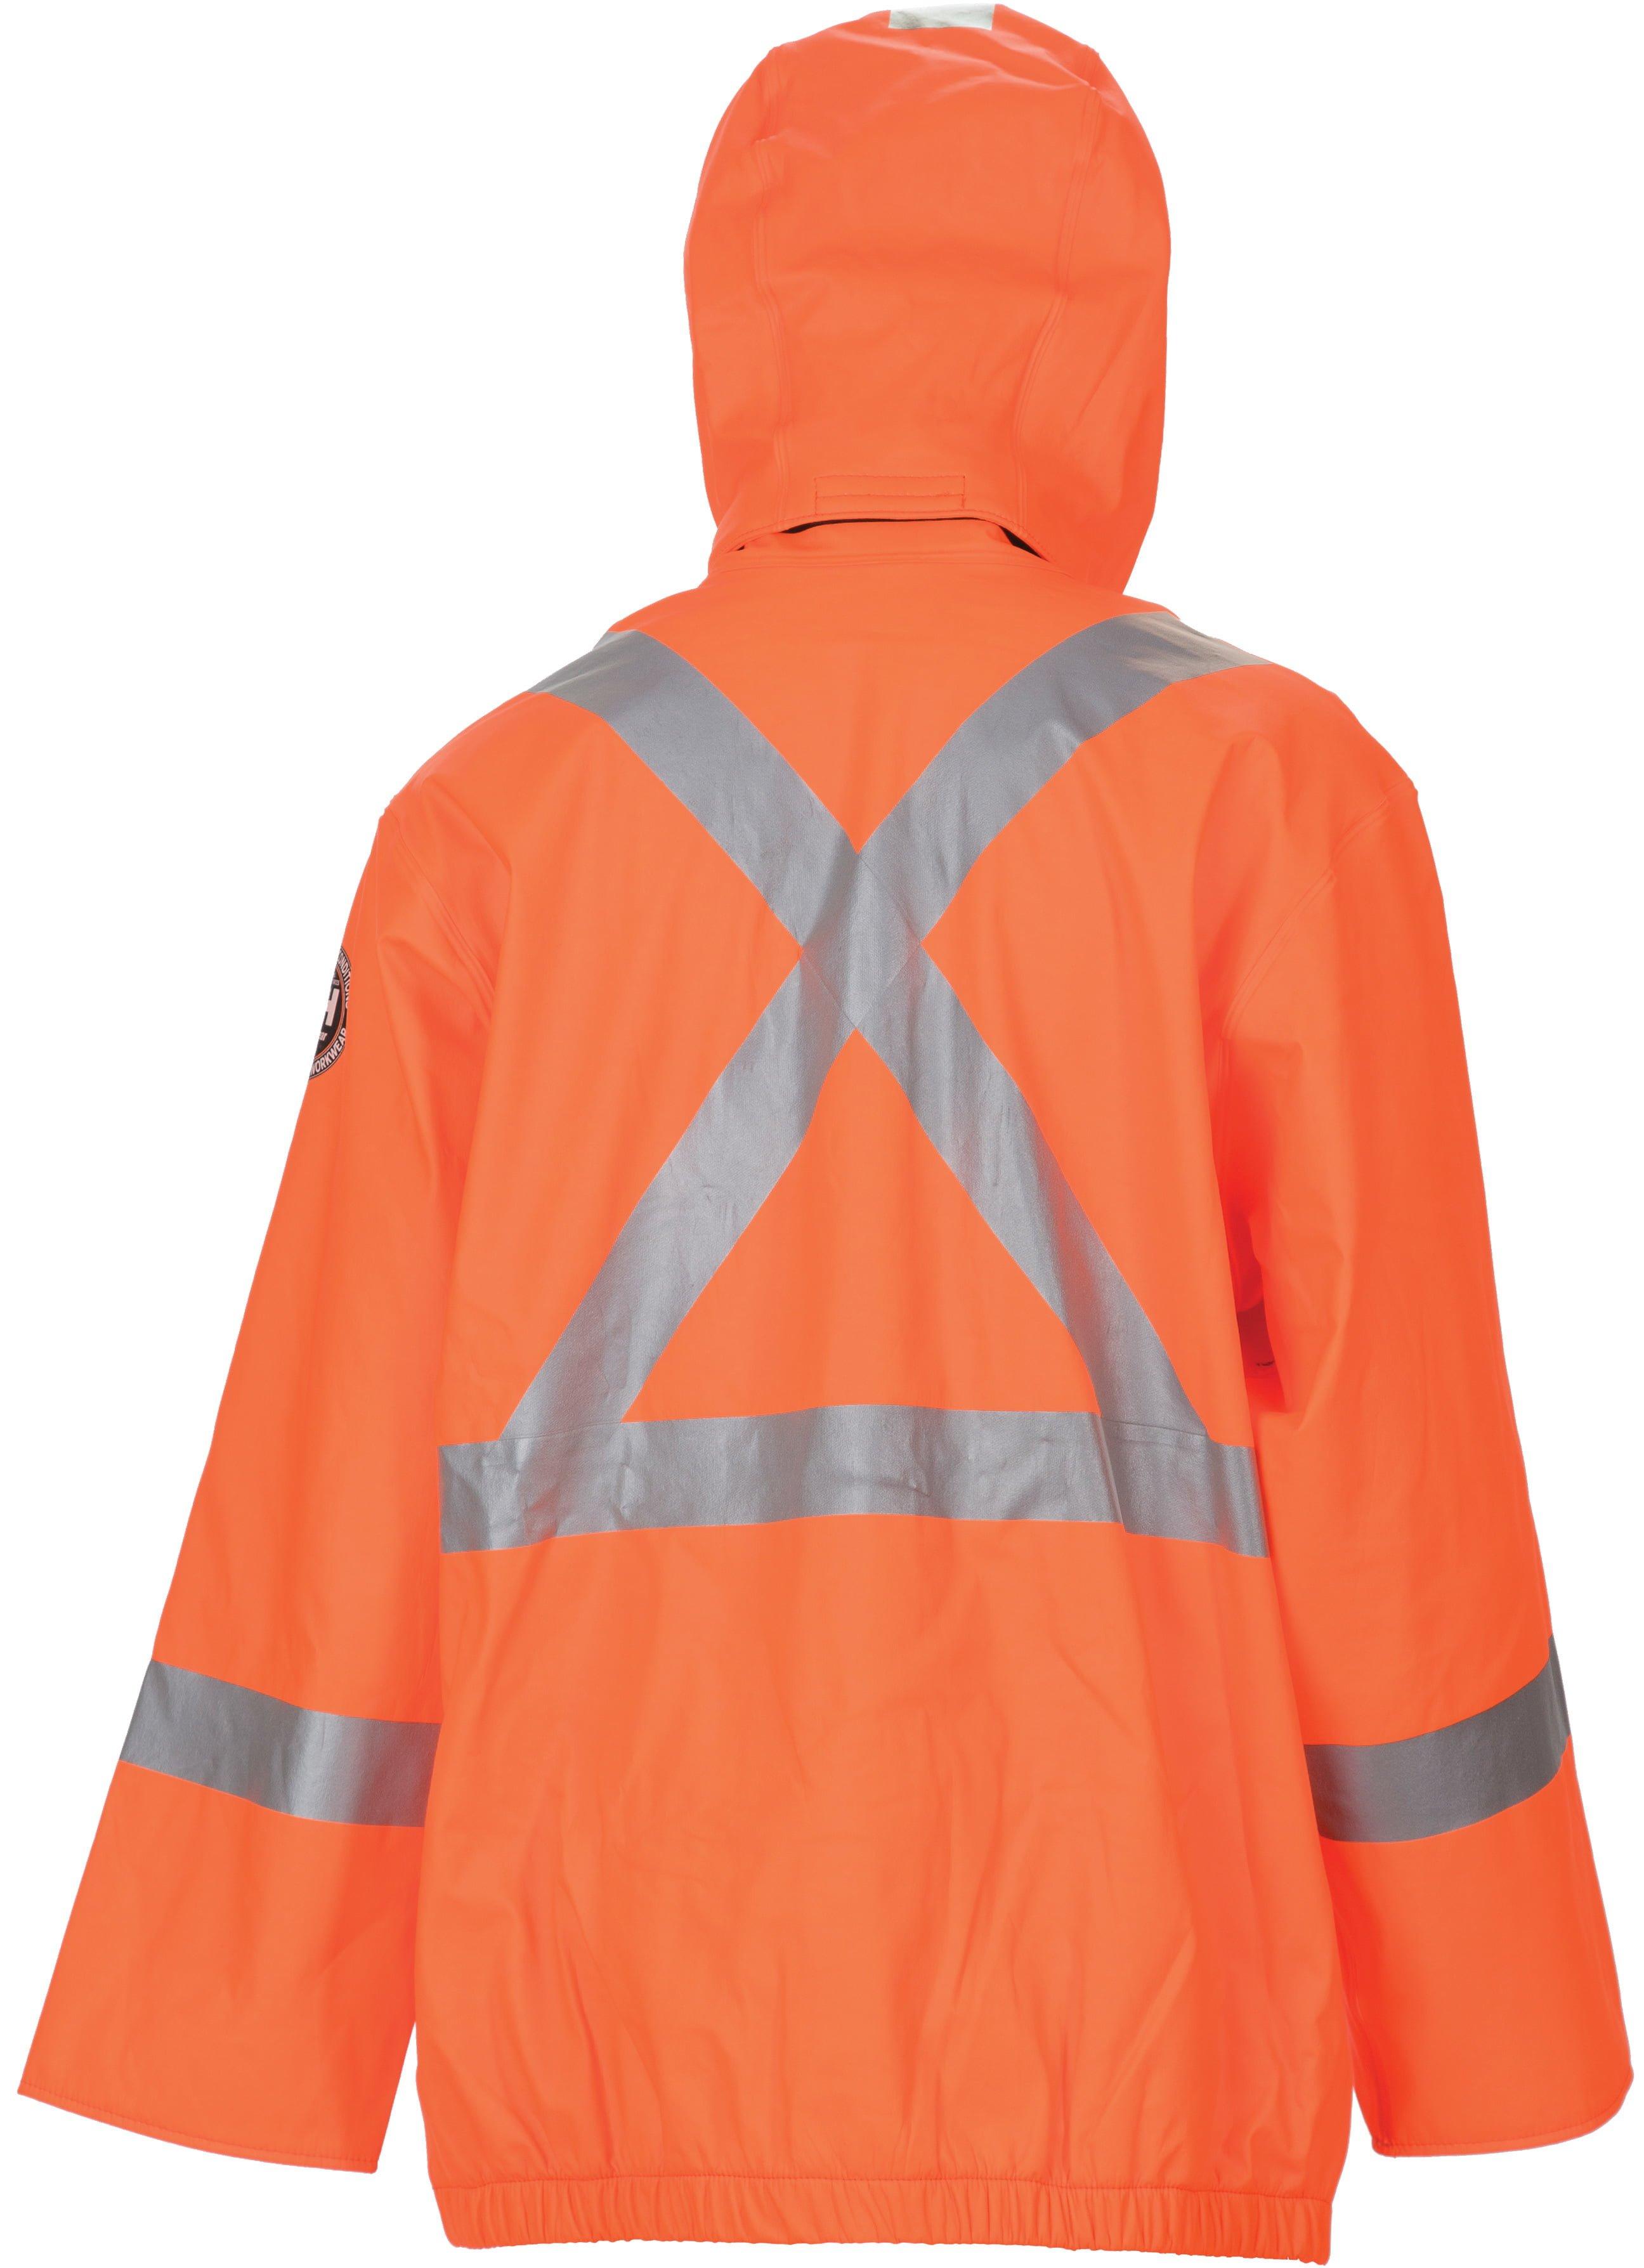 54ab542bff1d Helly Hansen Workwear 70219 Cornerbrook High Visibility Flame Retardant  Rain Jacket